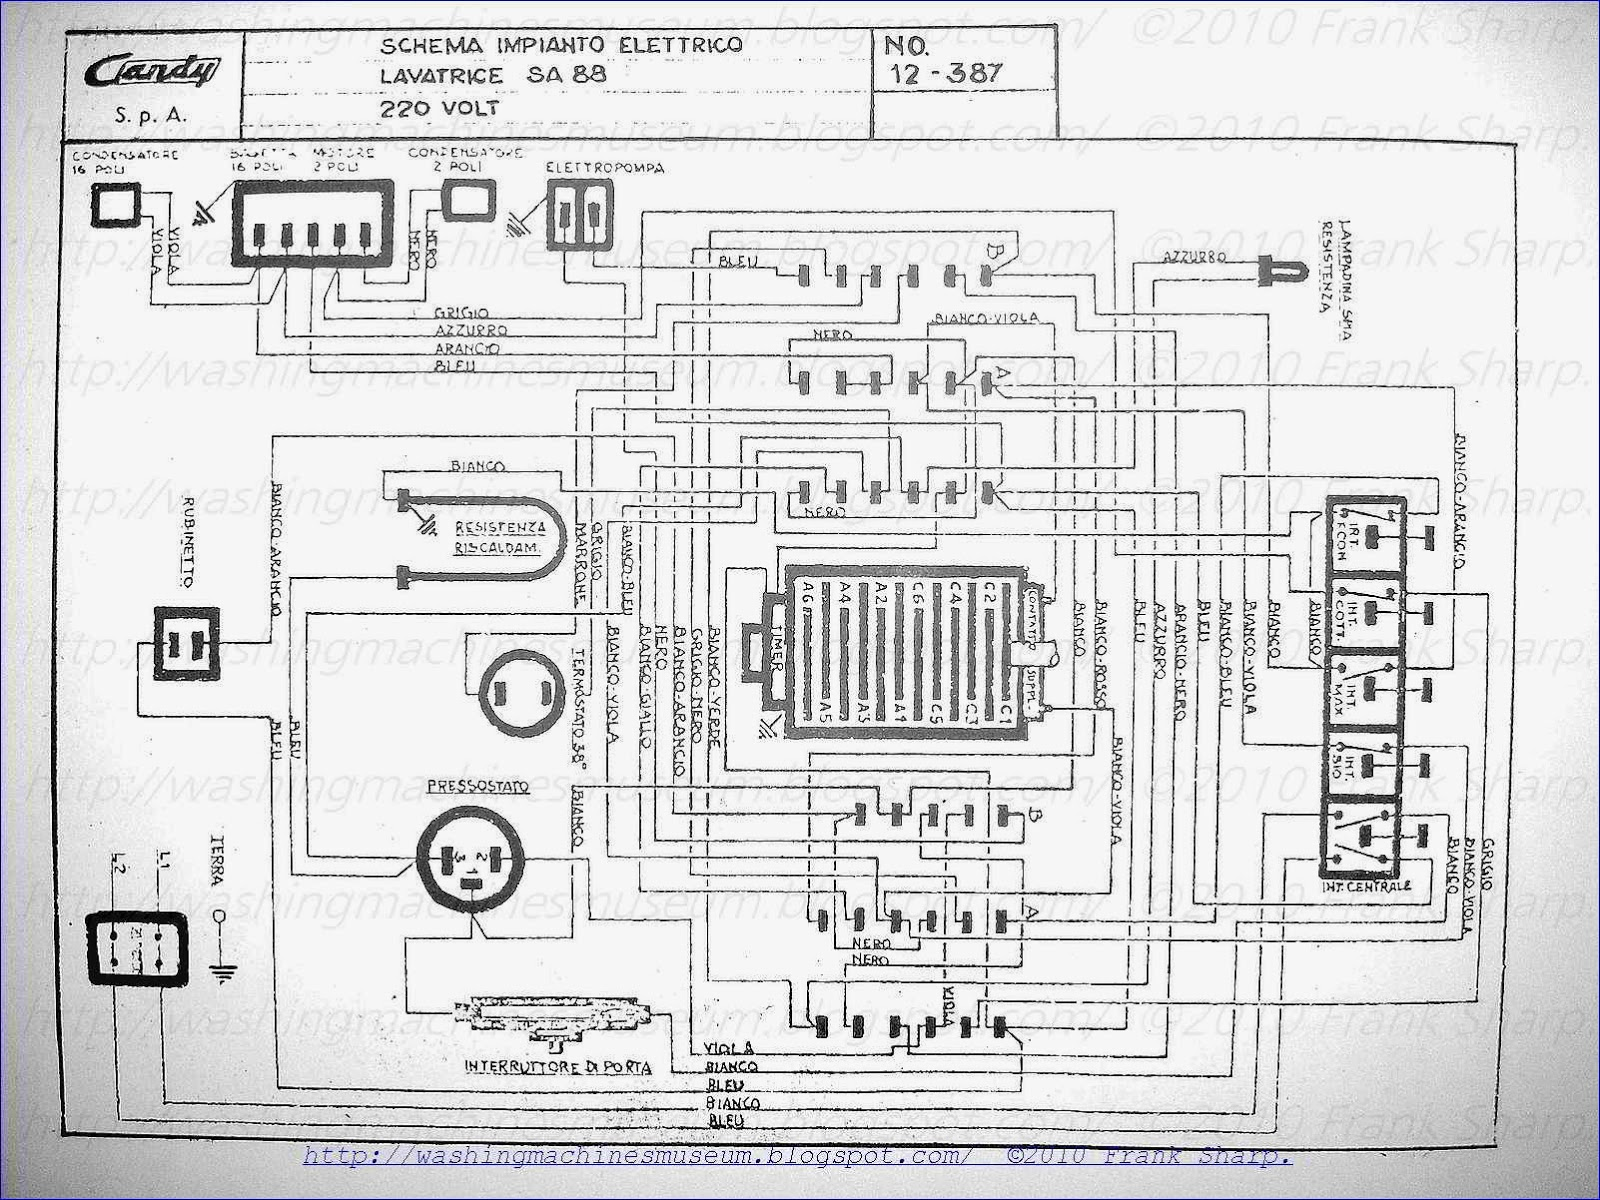 white knight tumble dryer wiring diagram yamaha pacifica 112v diagrams washing machines machine battery